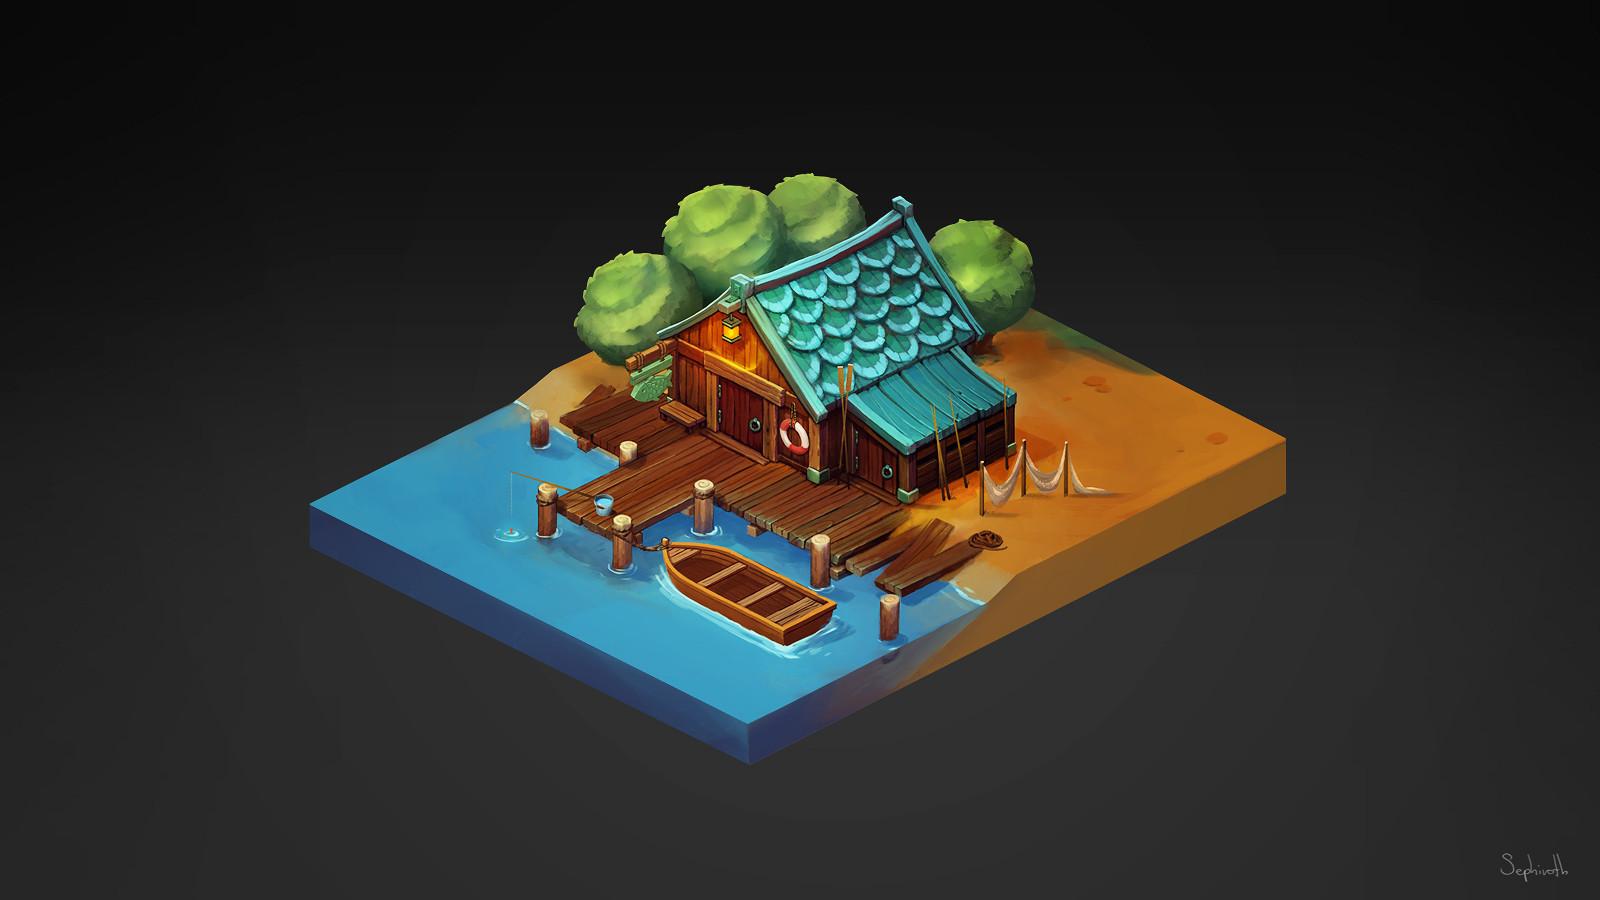 Isometric Fisherman's House